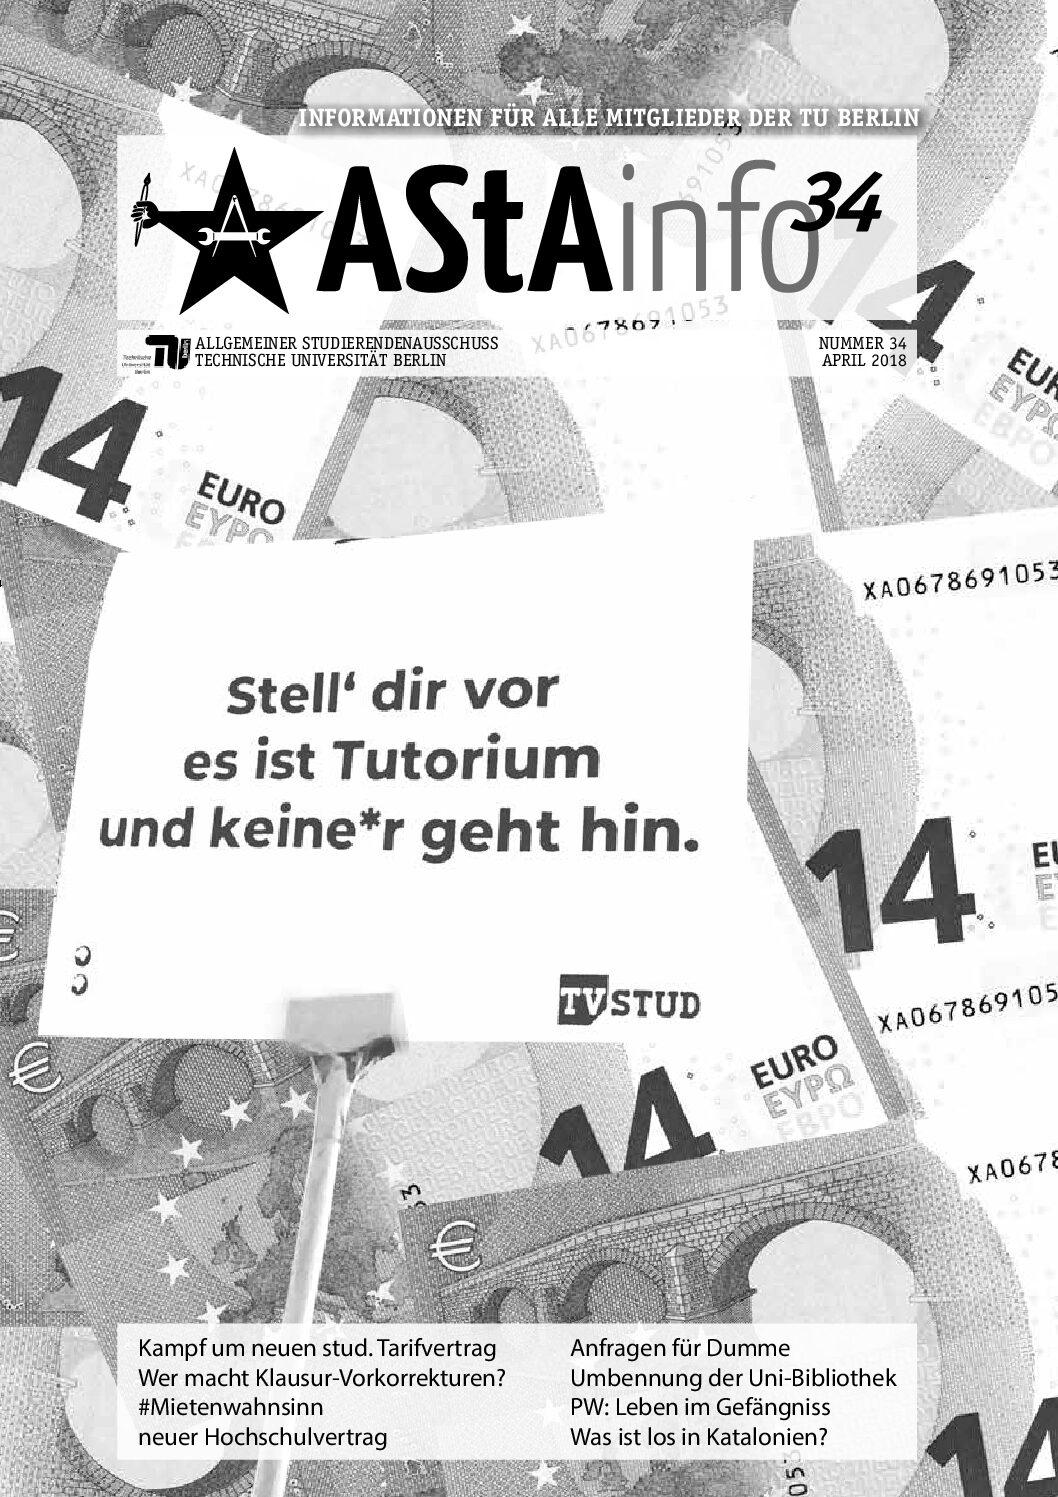 Studiengebühren Tu Berlin